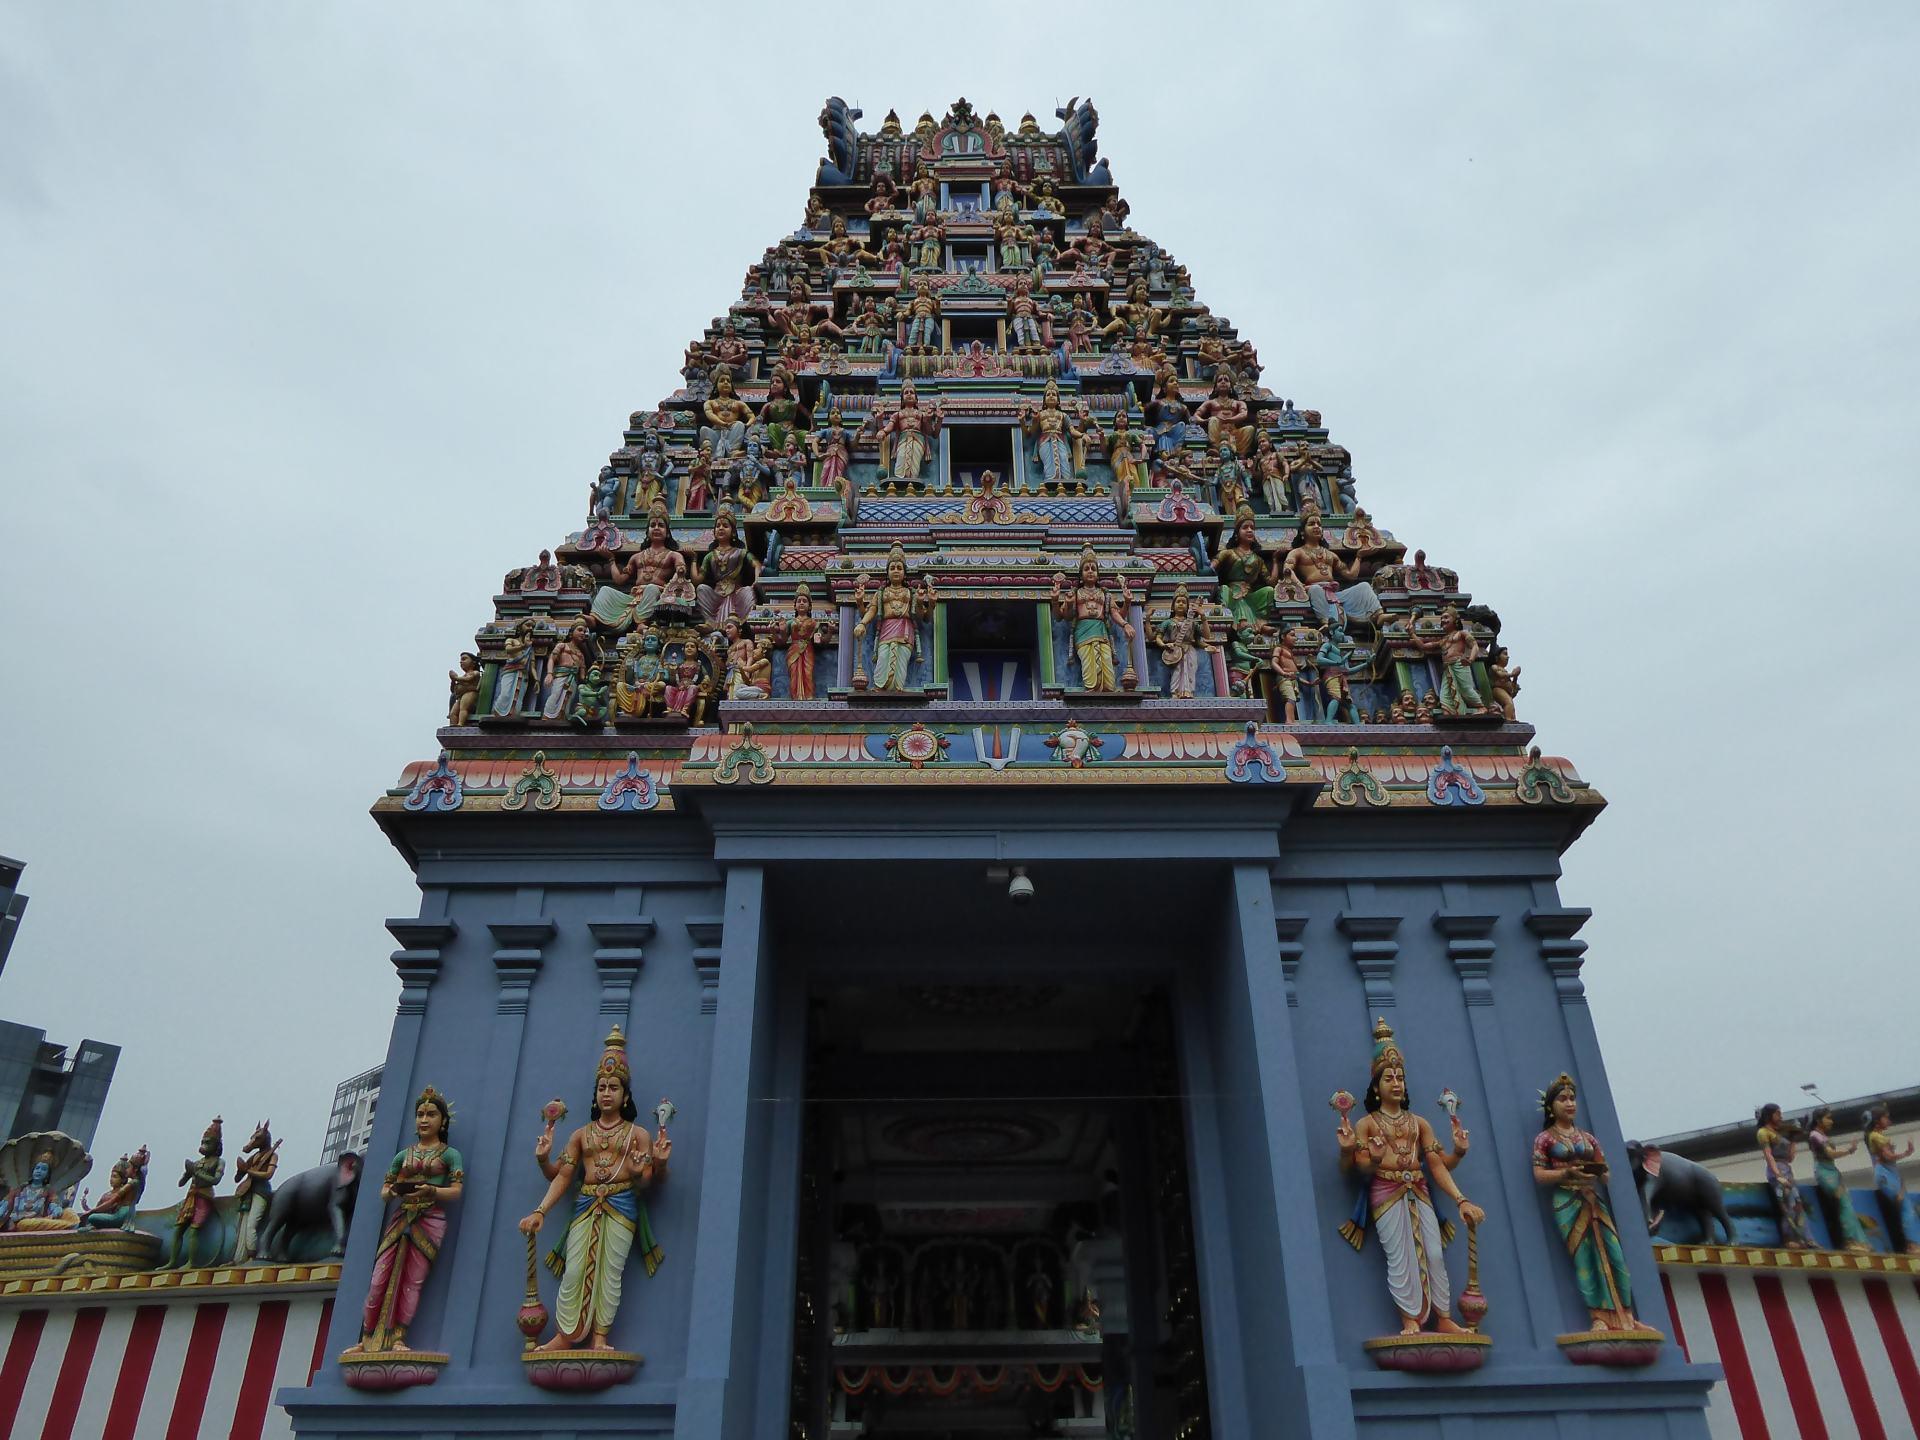 The Gopuram at the Sri Srinivasa Perumal Temple in Singapore. A Hindu Southeast Asian temple.